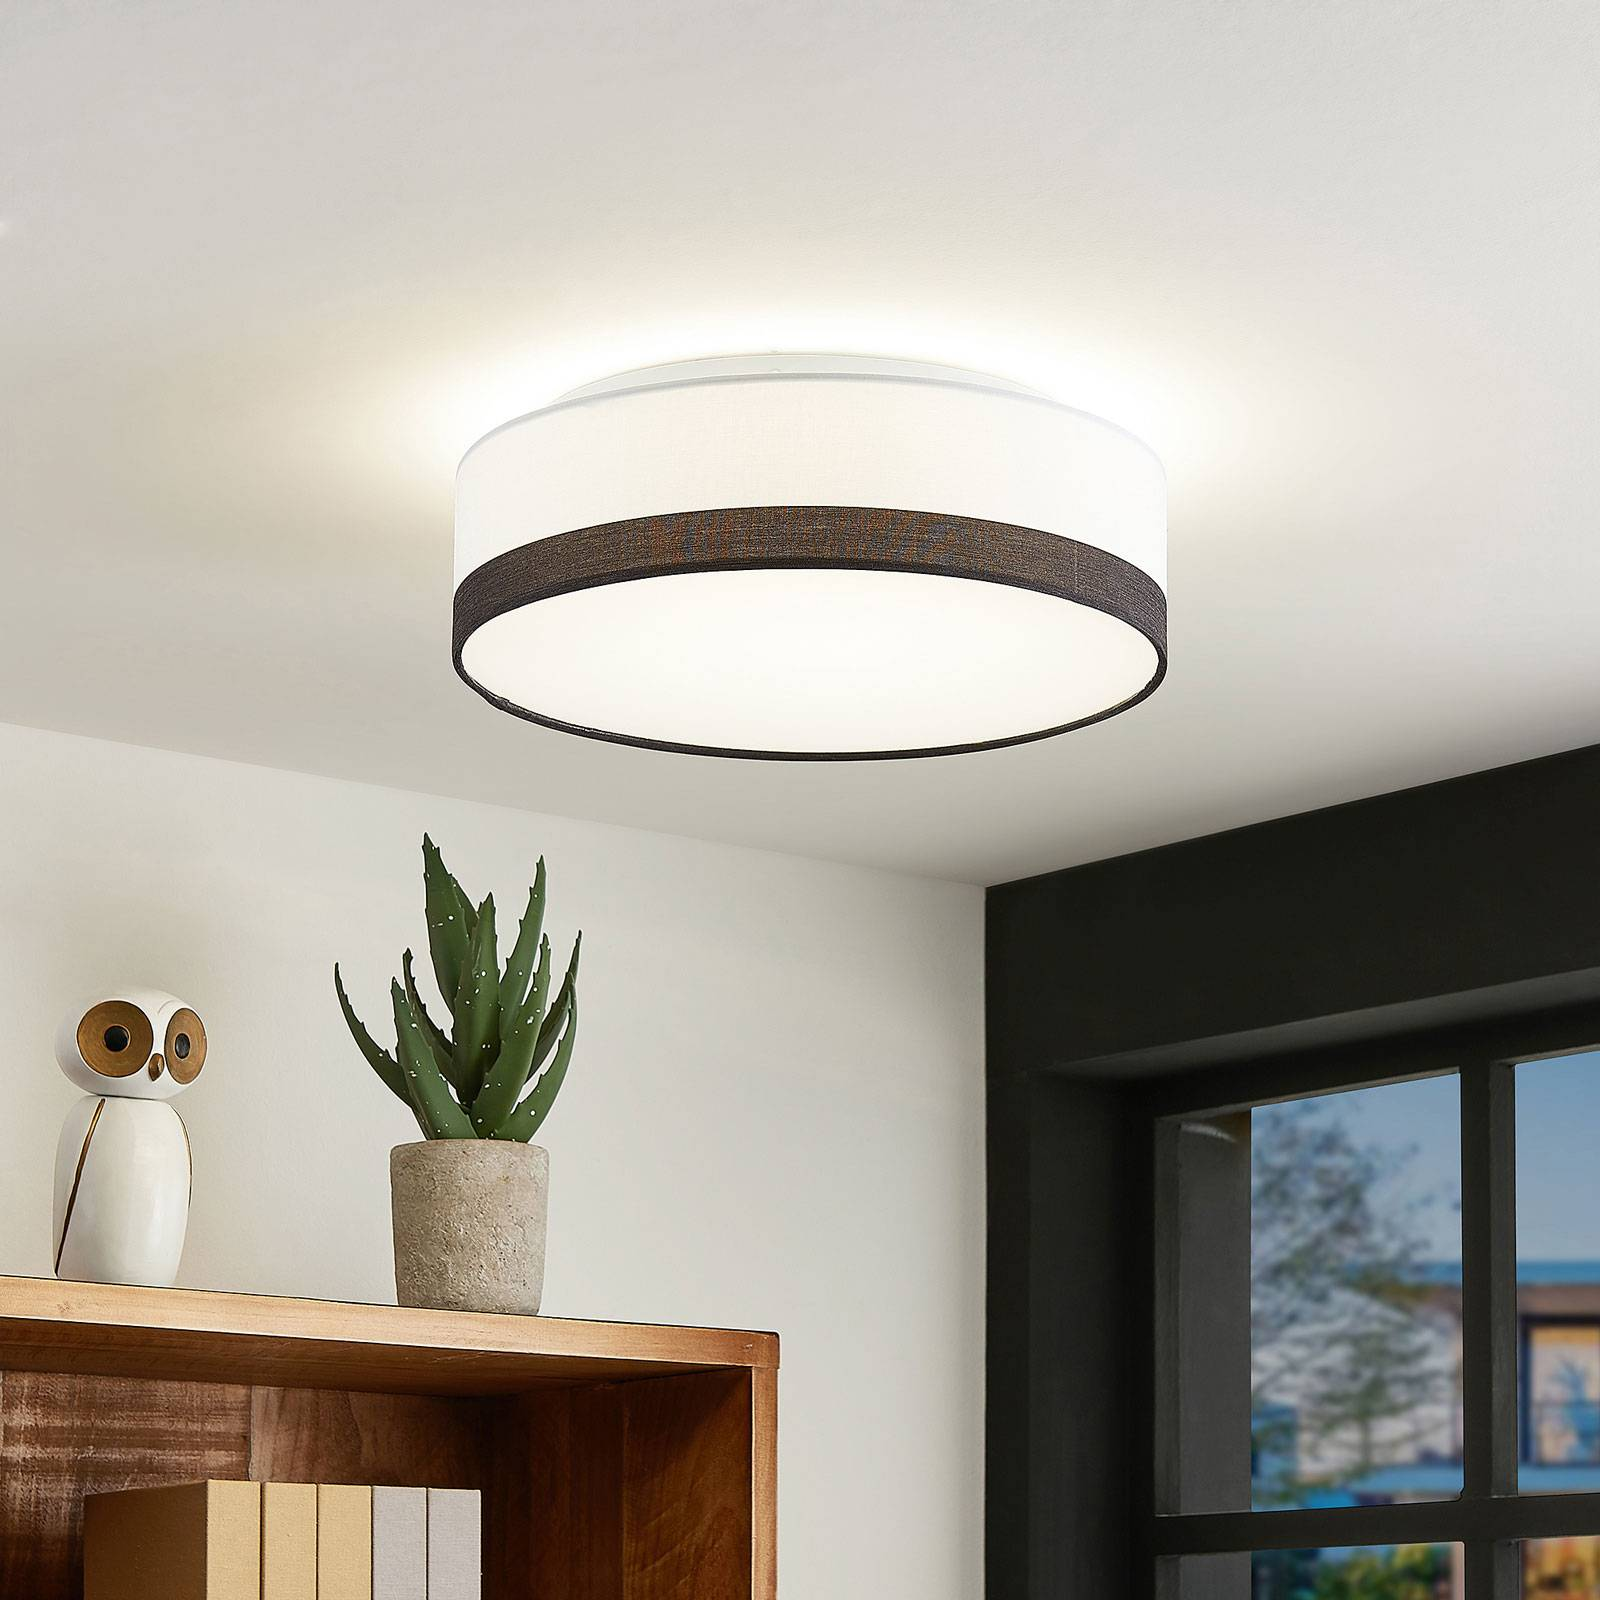 Lindby Laia LED plafondlamp, Ø 38cm